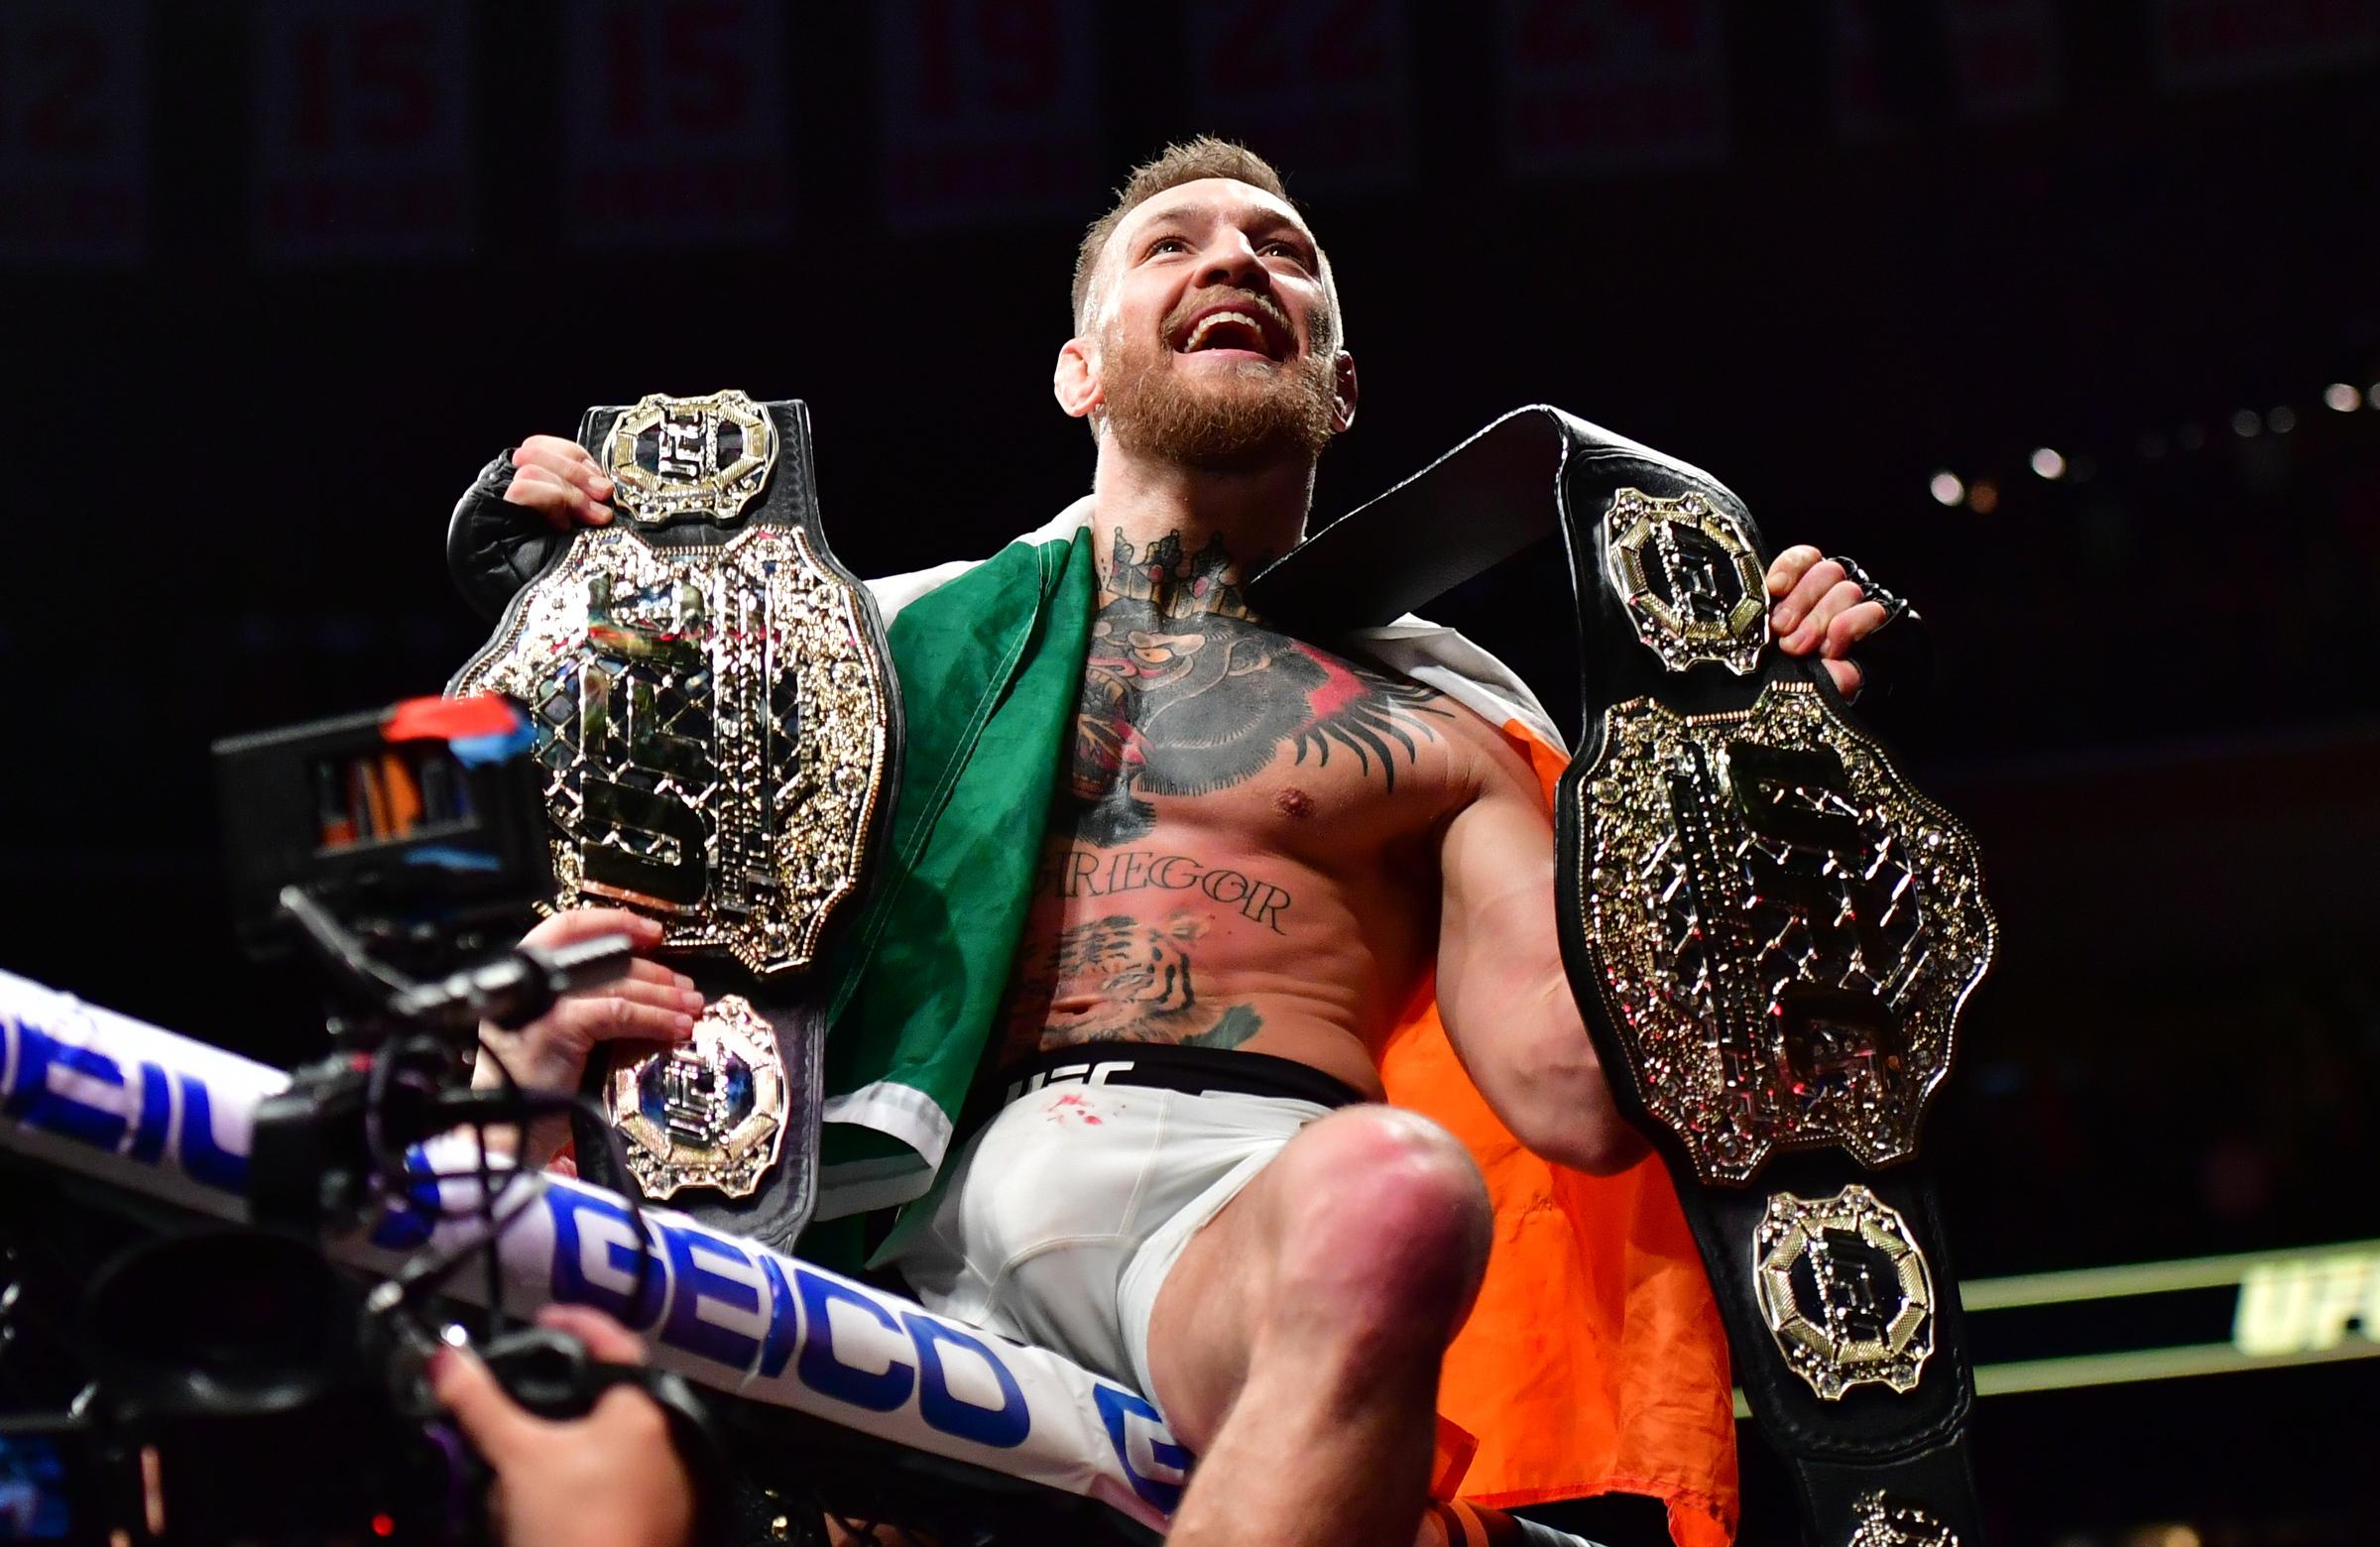 McGregor makes history at UFC 205. Image: PA